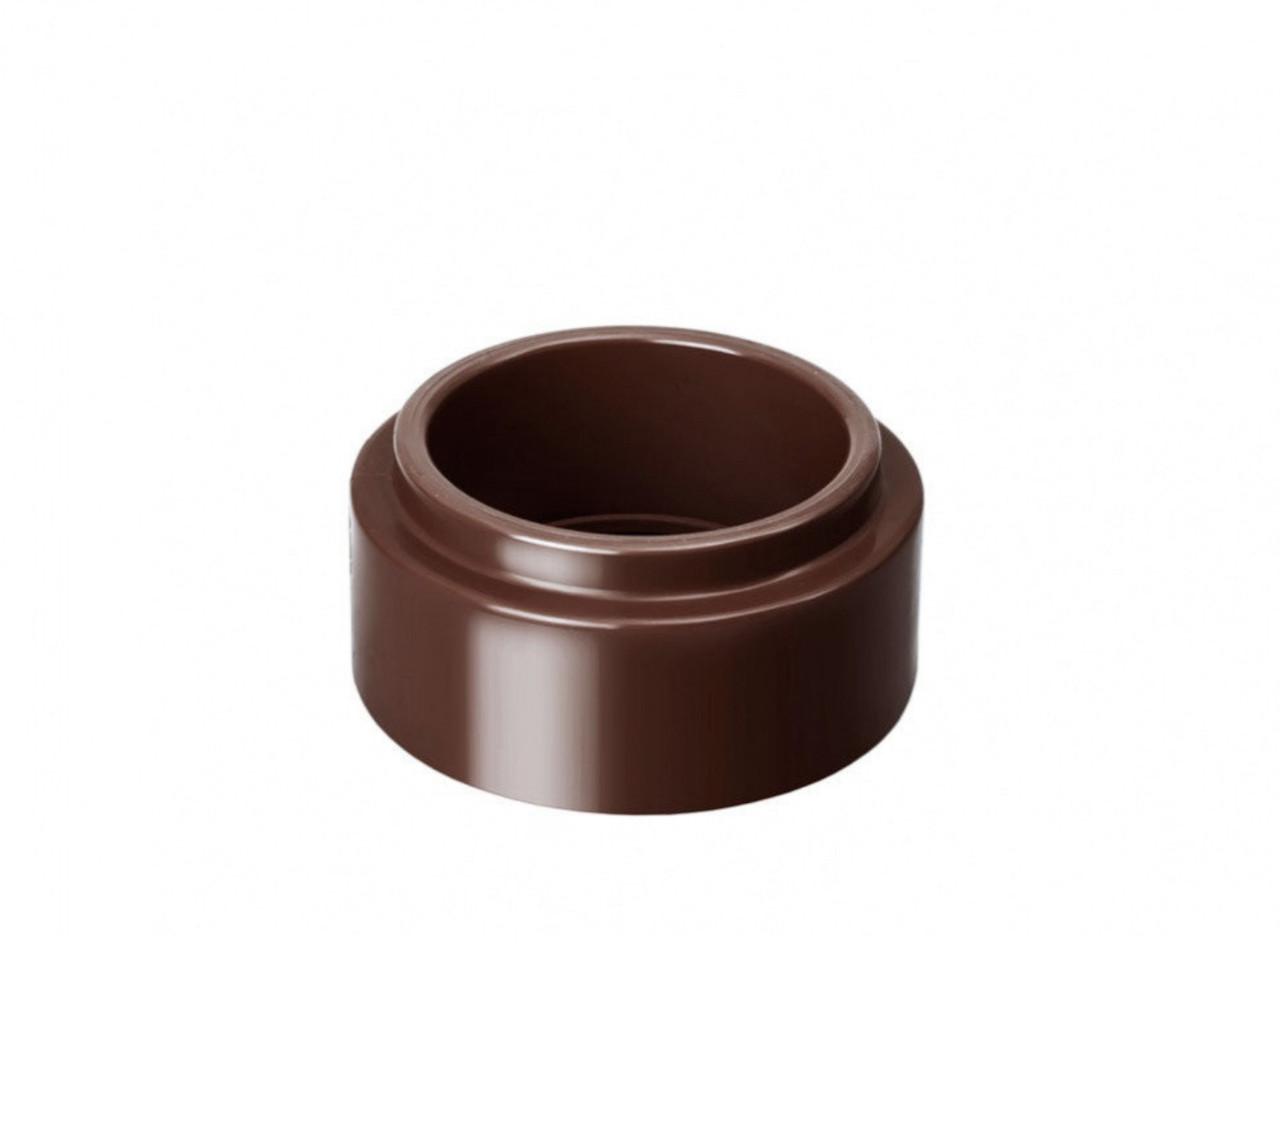 Адаптер трубы коричневый Ø100-75  130/100 RainWay